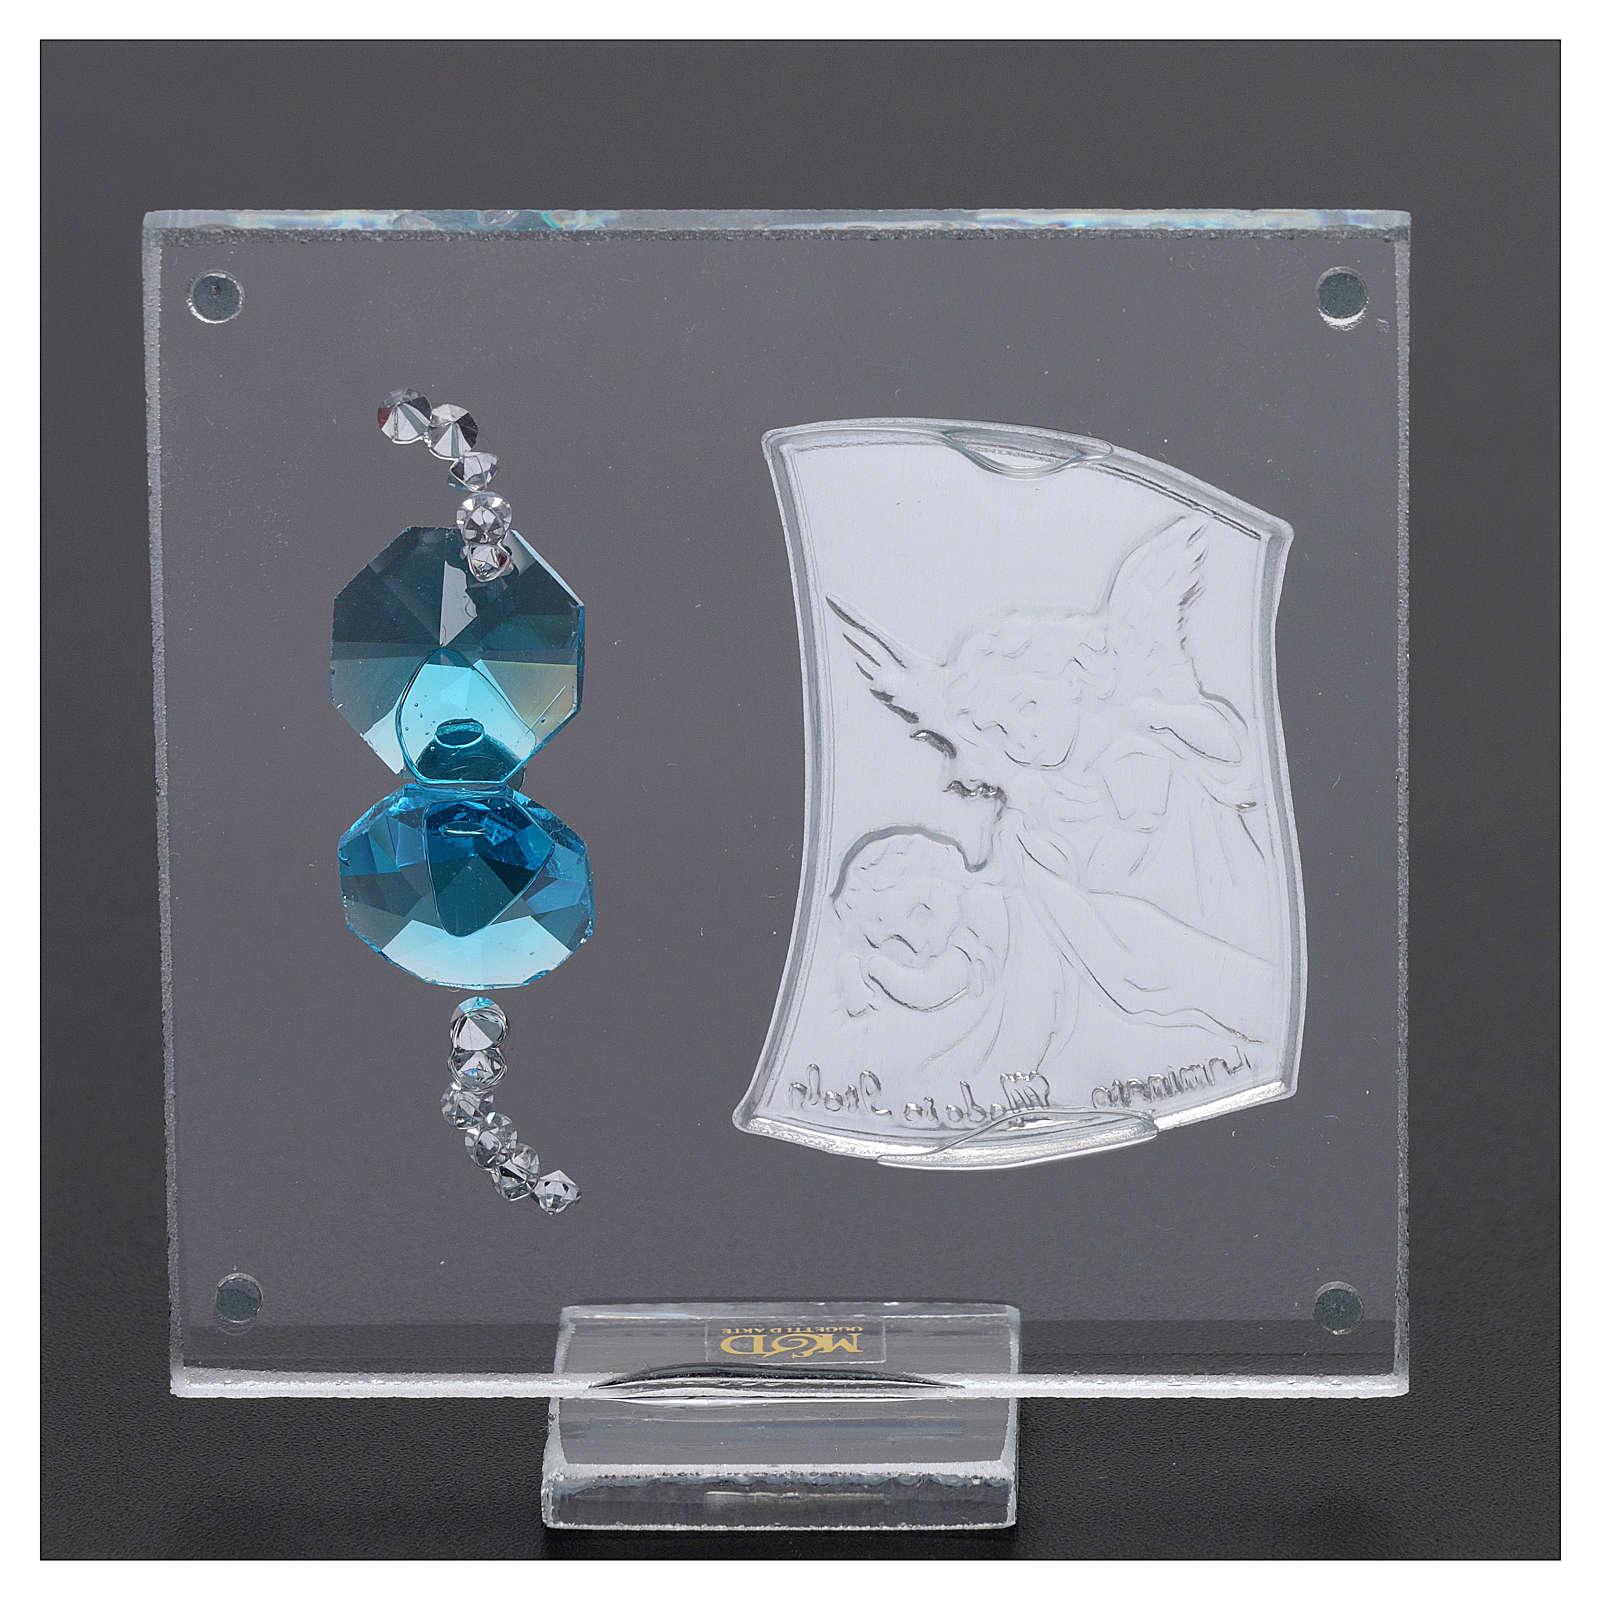 Party favour with Guardian Angel on foil 5x5 cm 3